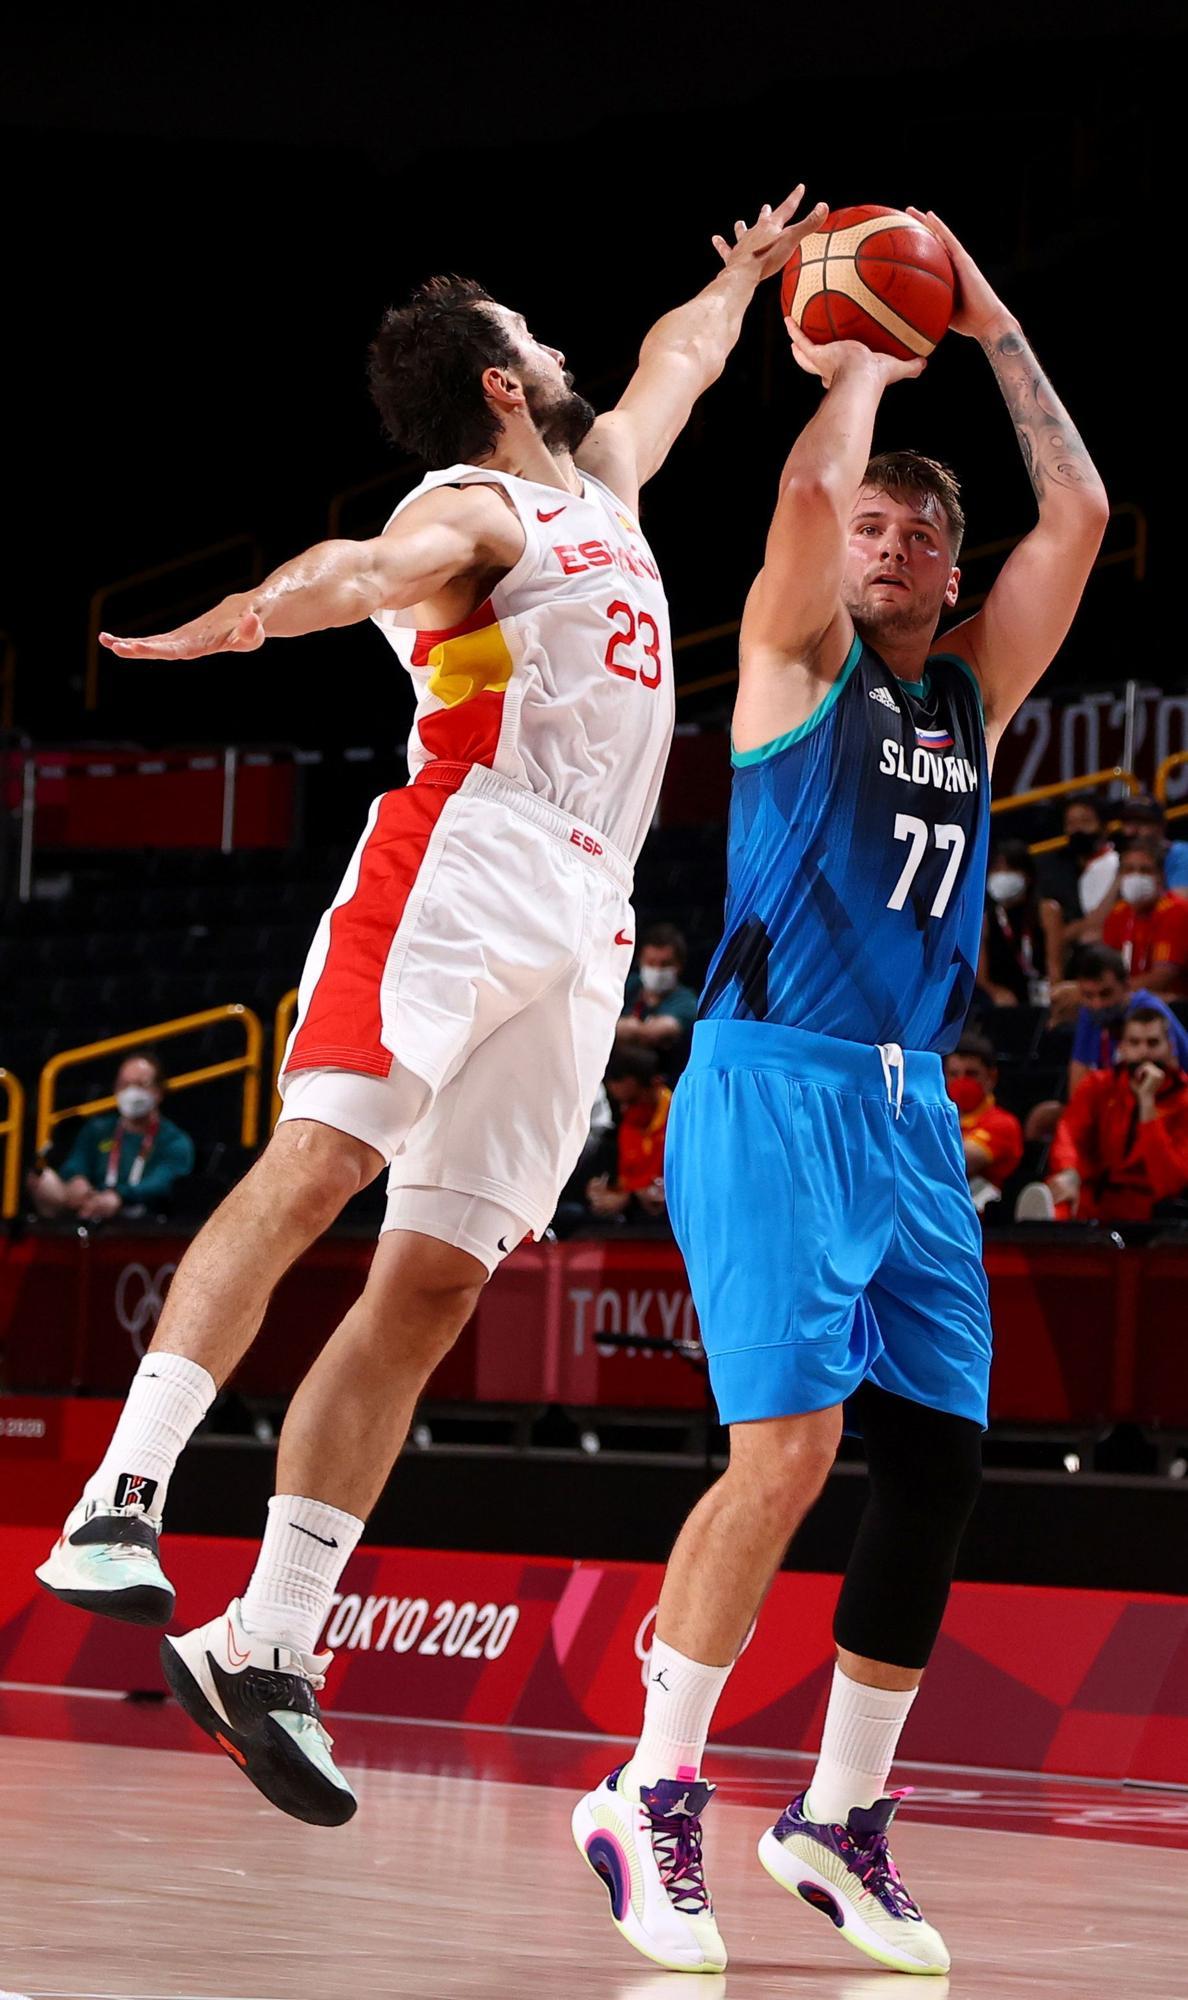 baloncesto-4.jpg